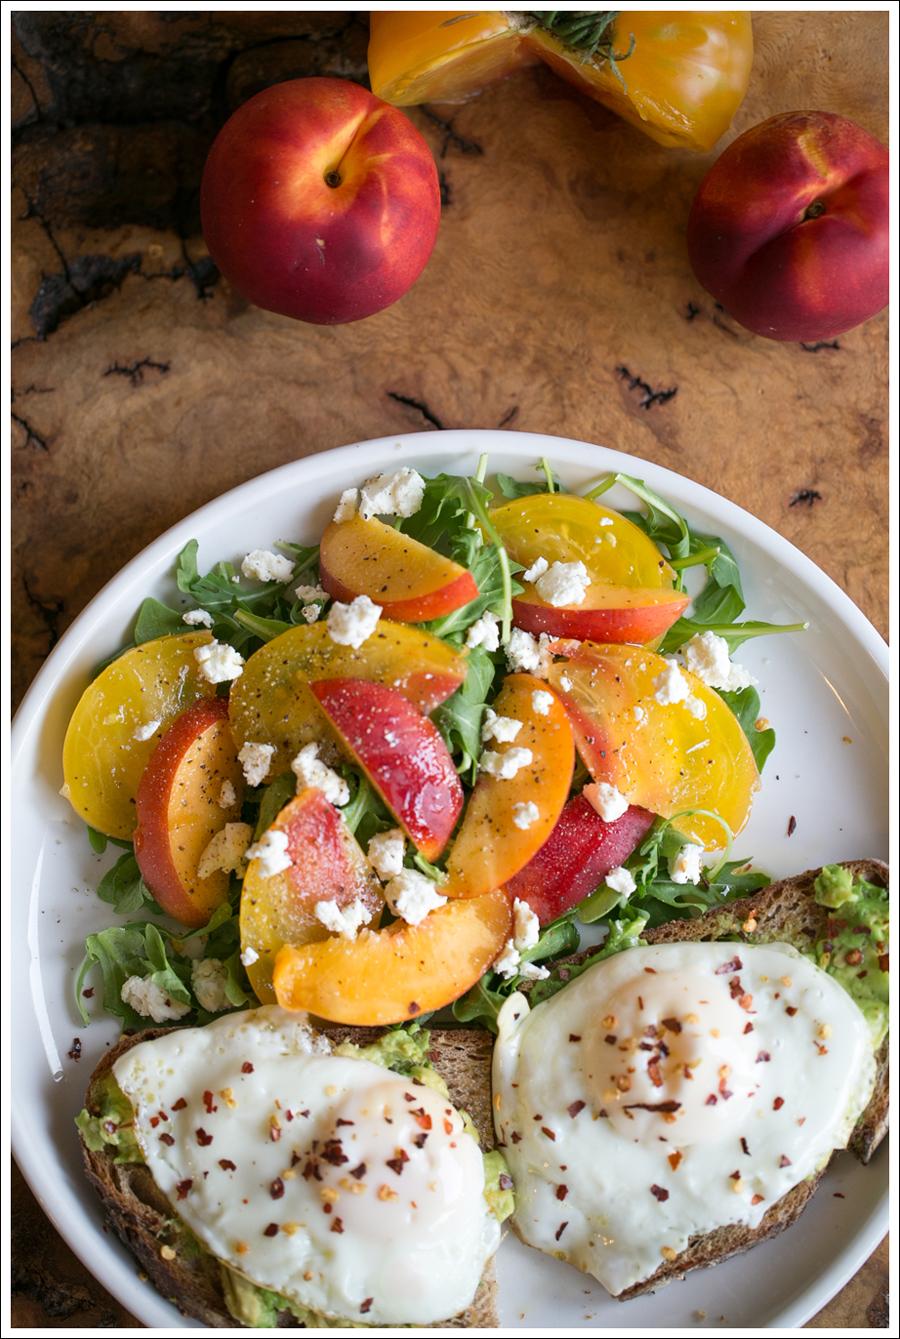 Blog Heirloom Tomato Nectarine Goat Cheese and Arugula Salad with Avocado Toast and Fried Egg-5